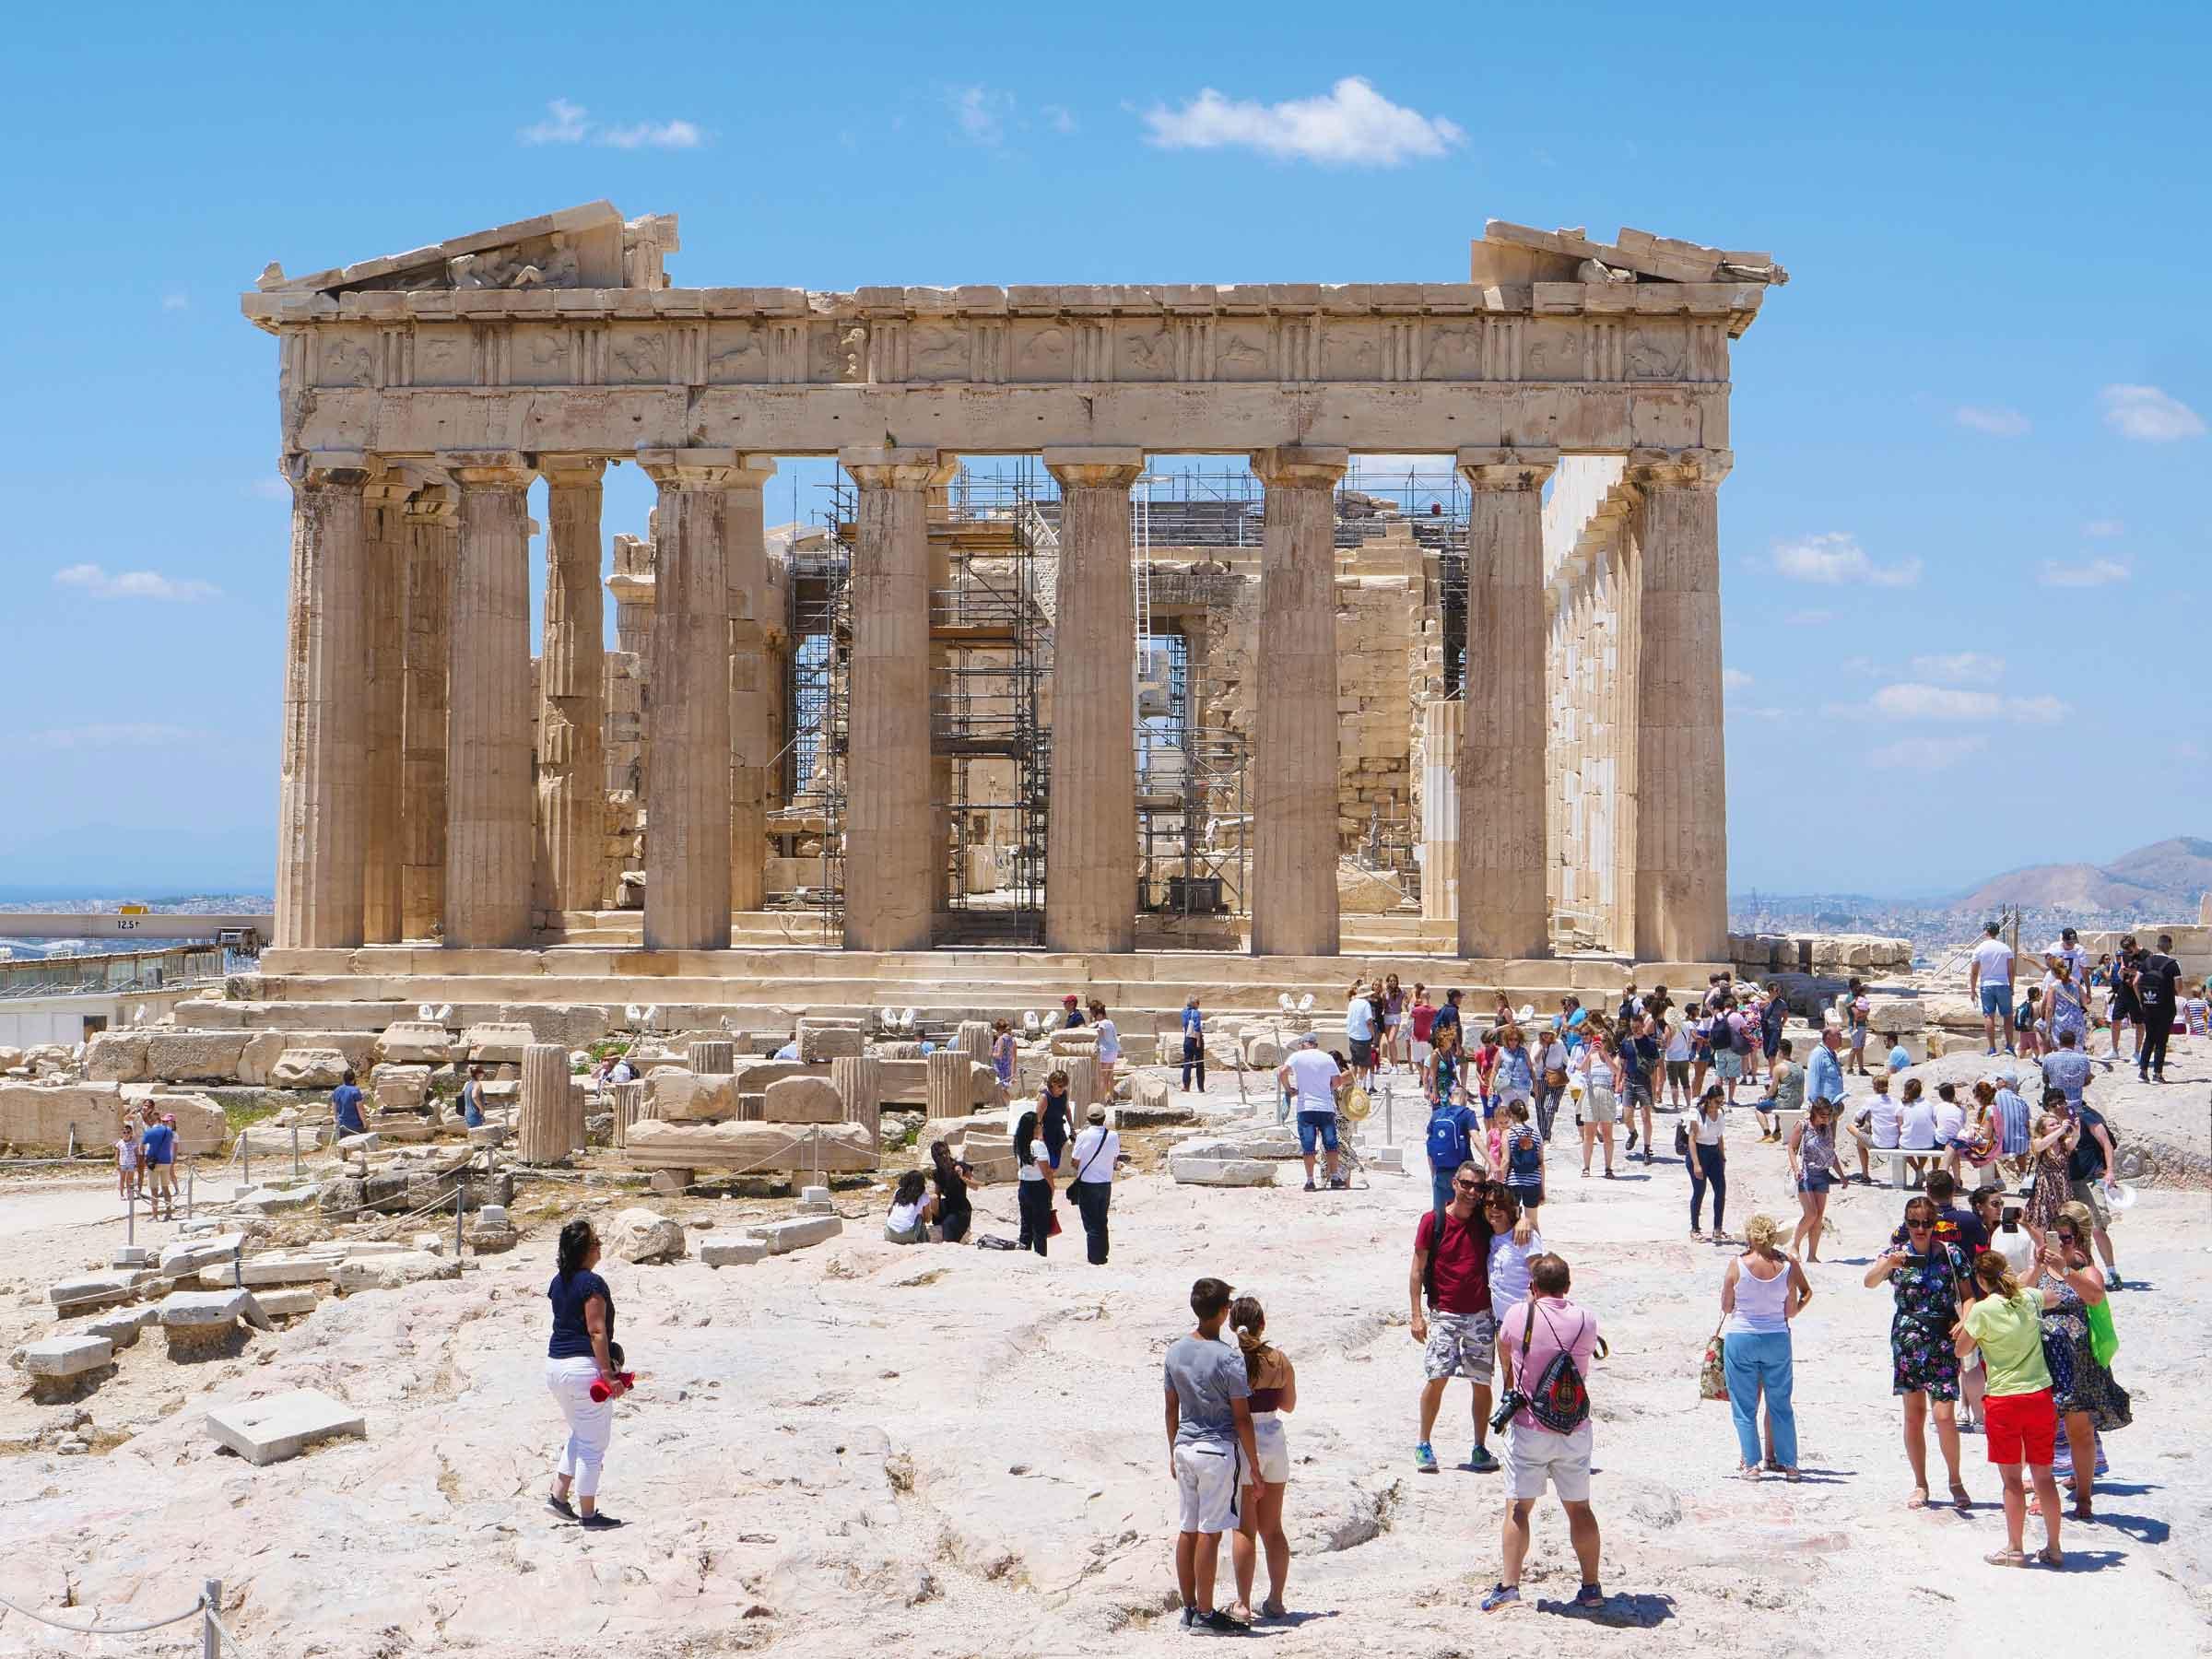 The Acropolis and Parthenon | Dr Steven Andrew Martin | 2019 Photo